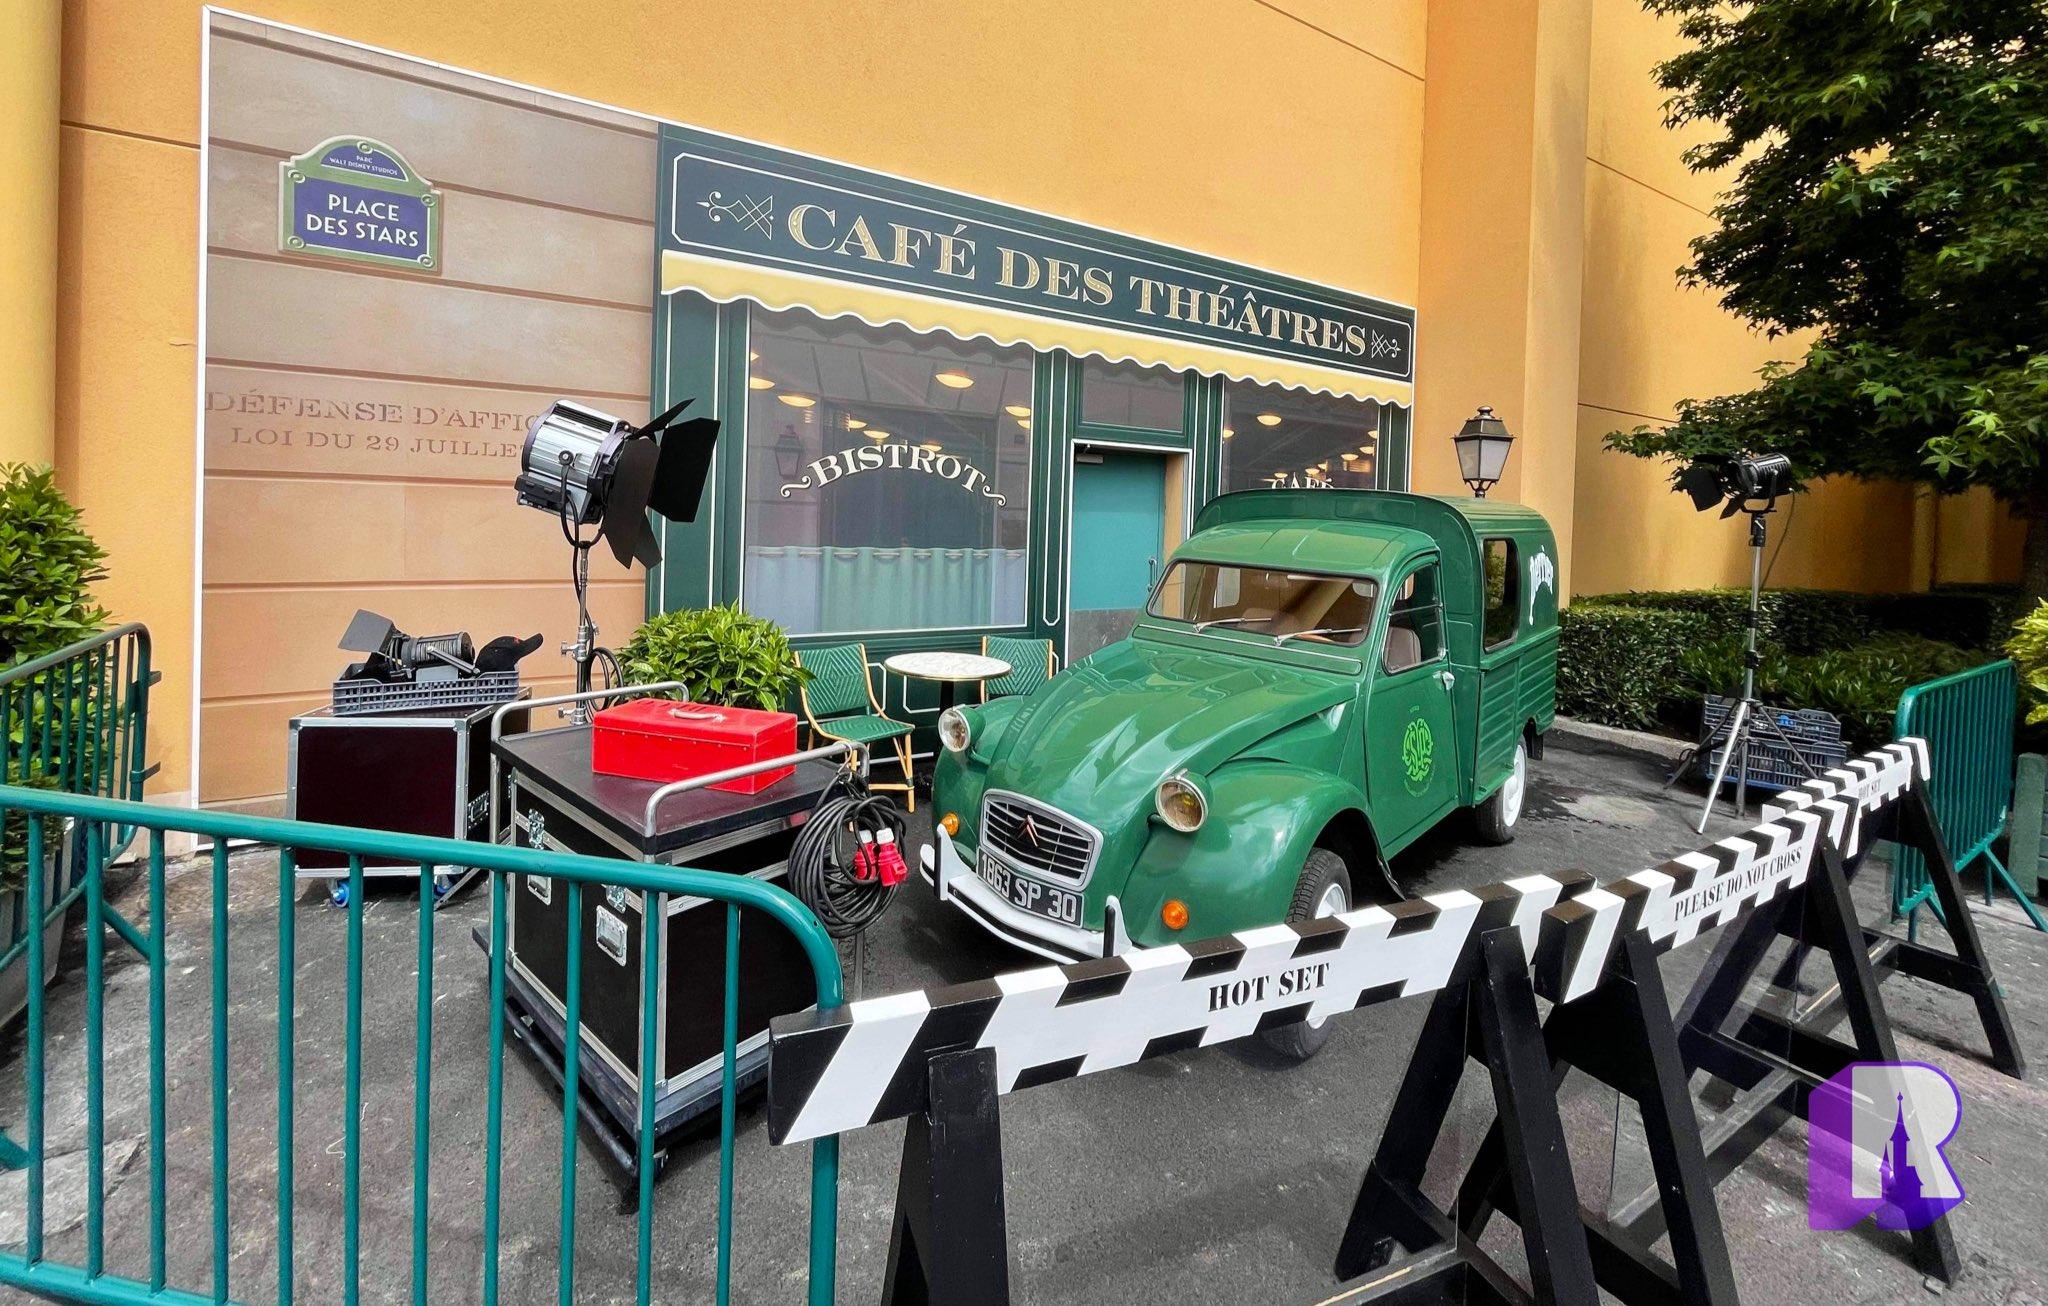 Les bizarreries de Disneyland Paris  E5huJbPXoAAD36O?format=jpg&name=large